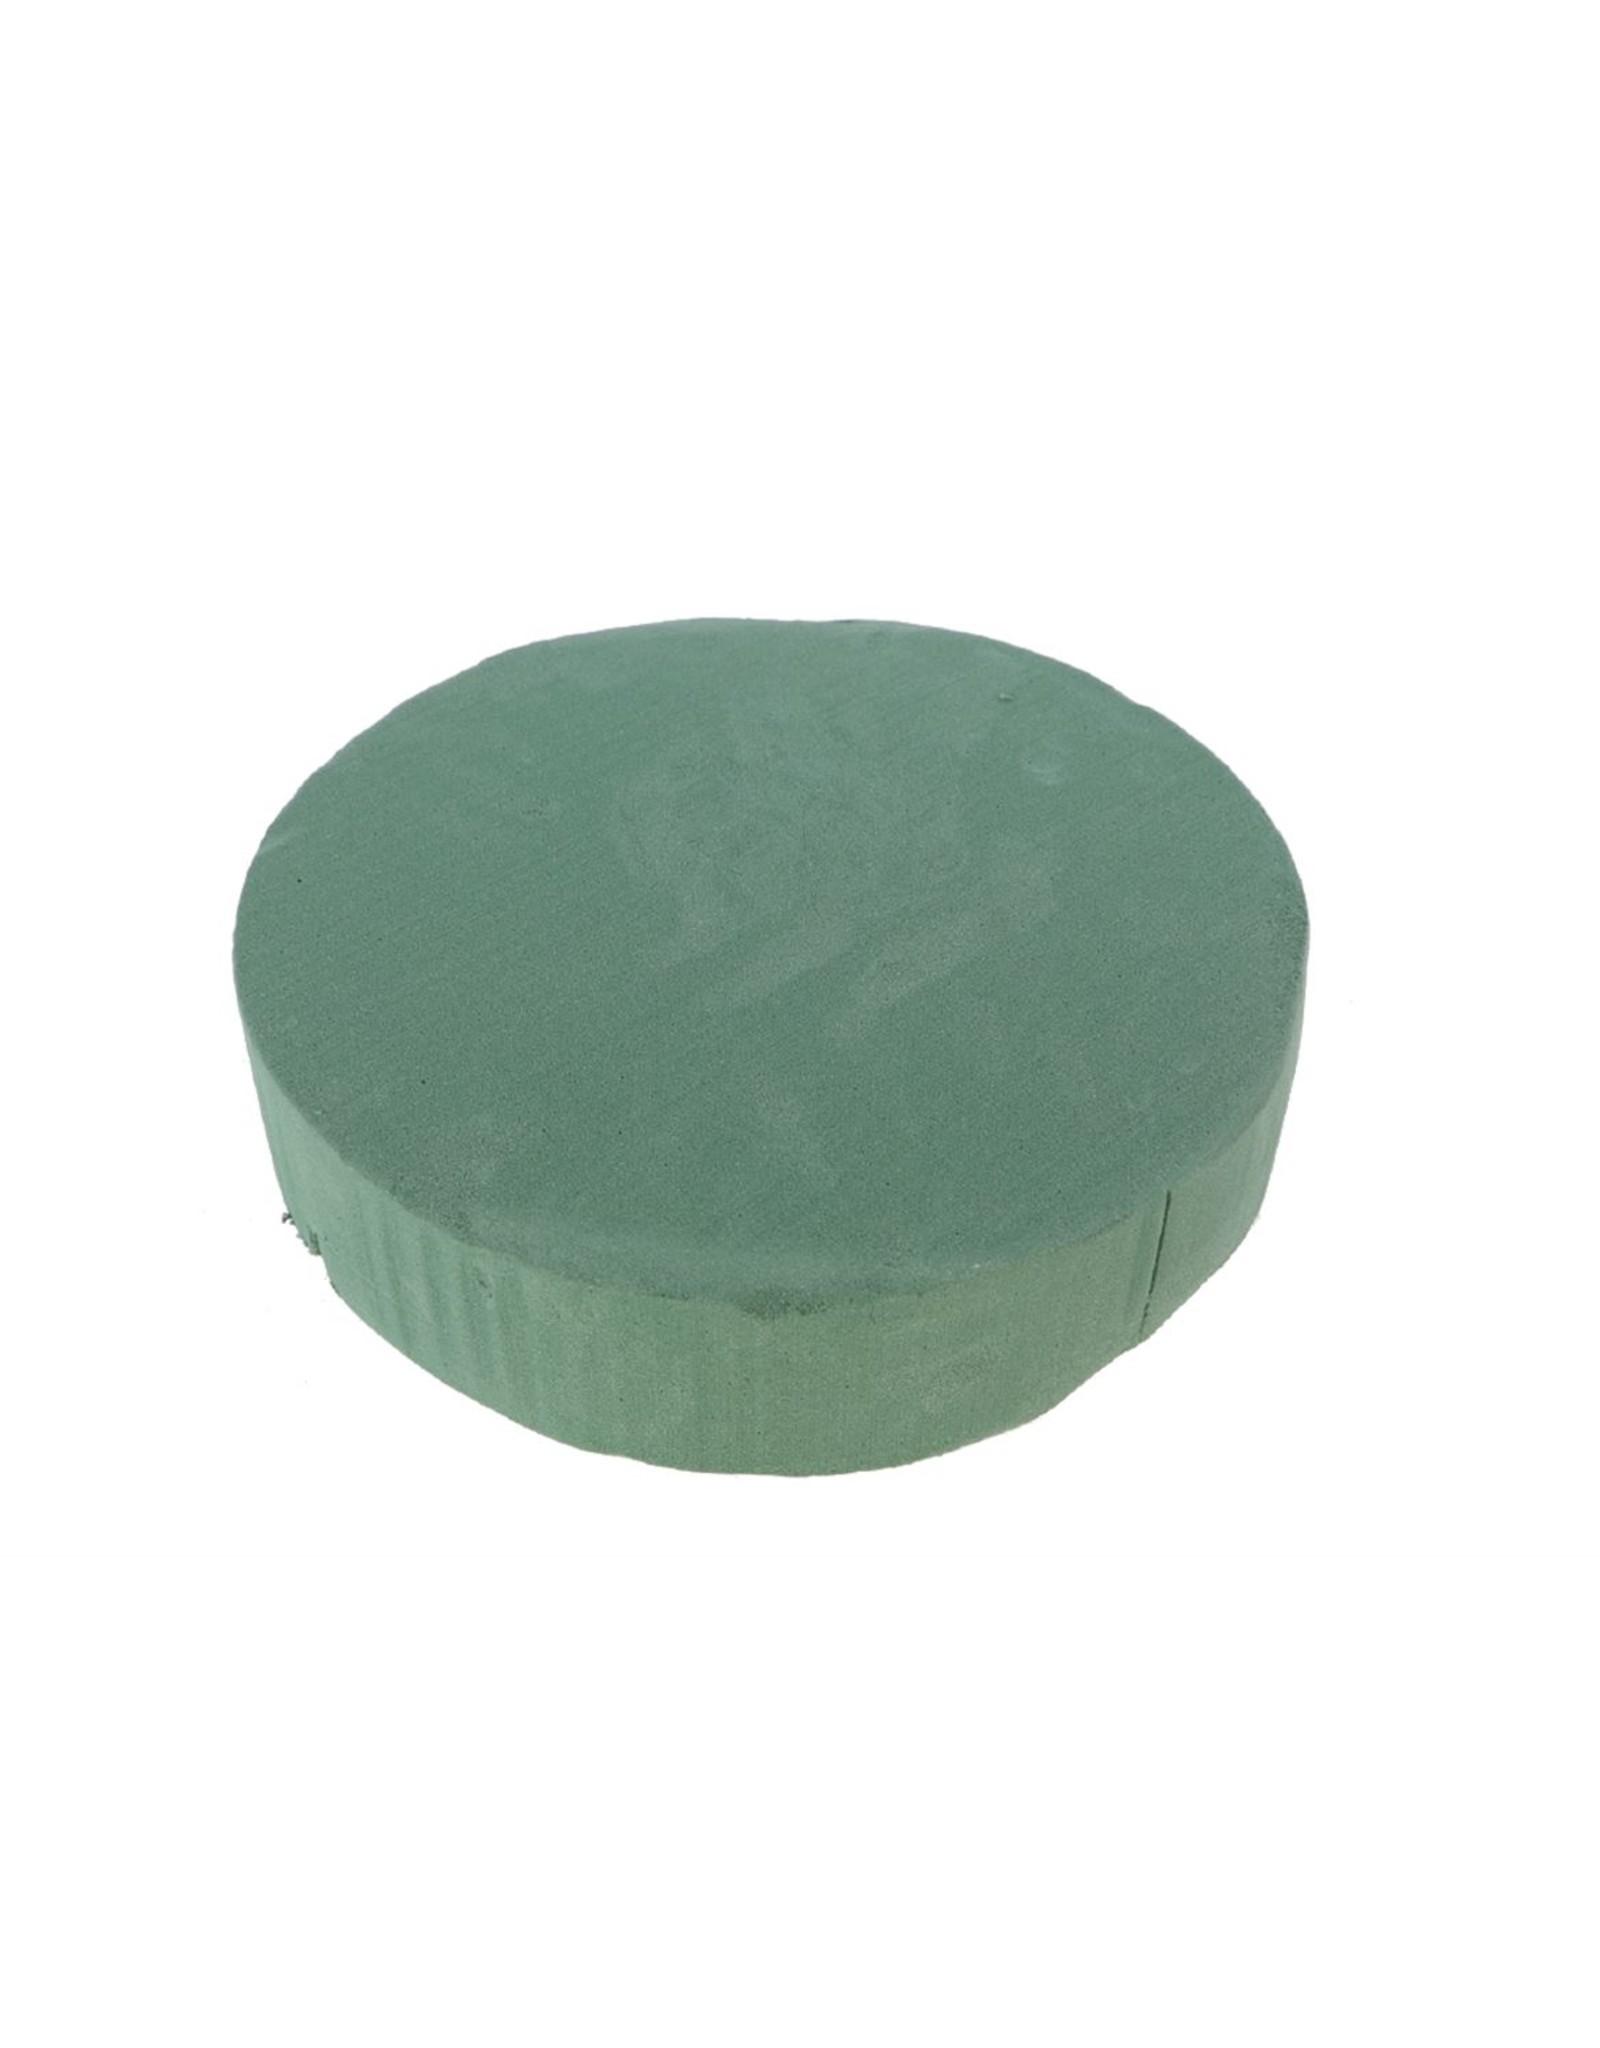 HD Basic Cake Sld Foam D30.0h7.0 x 8